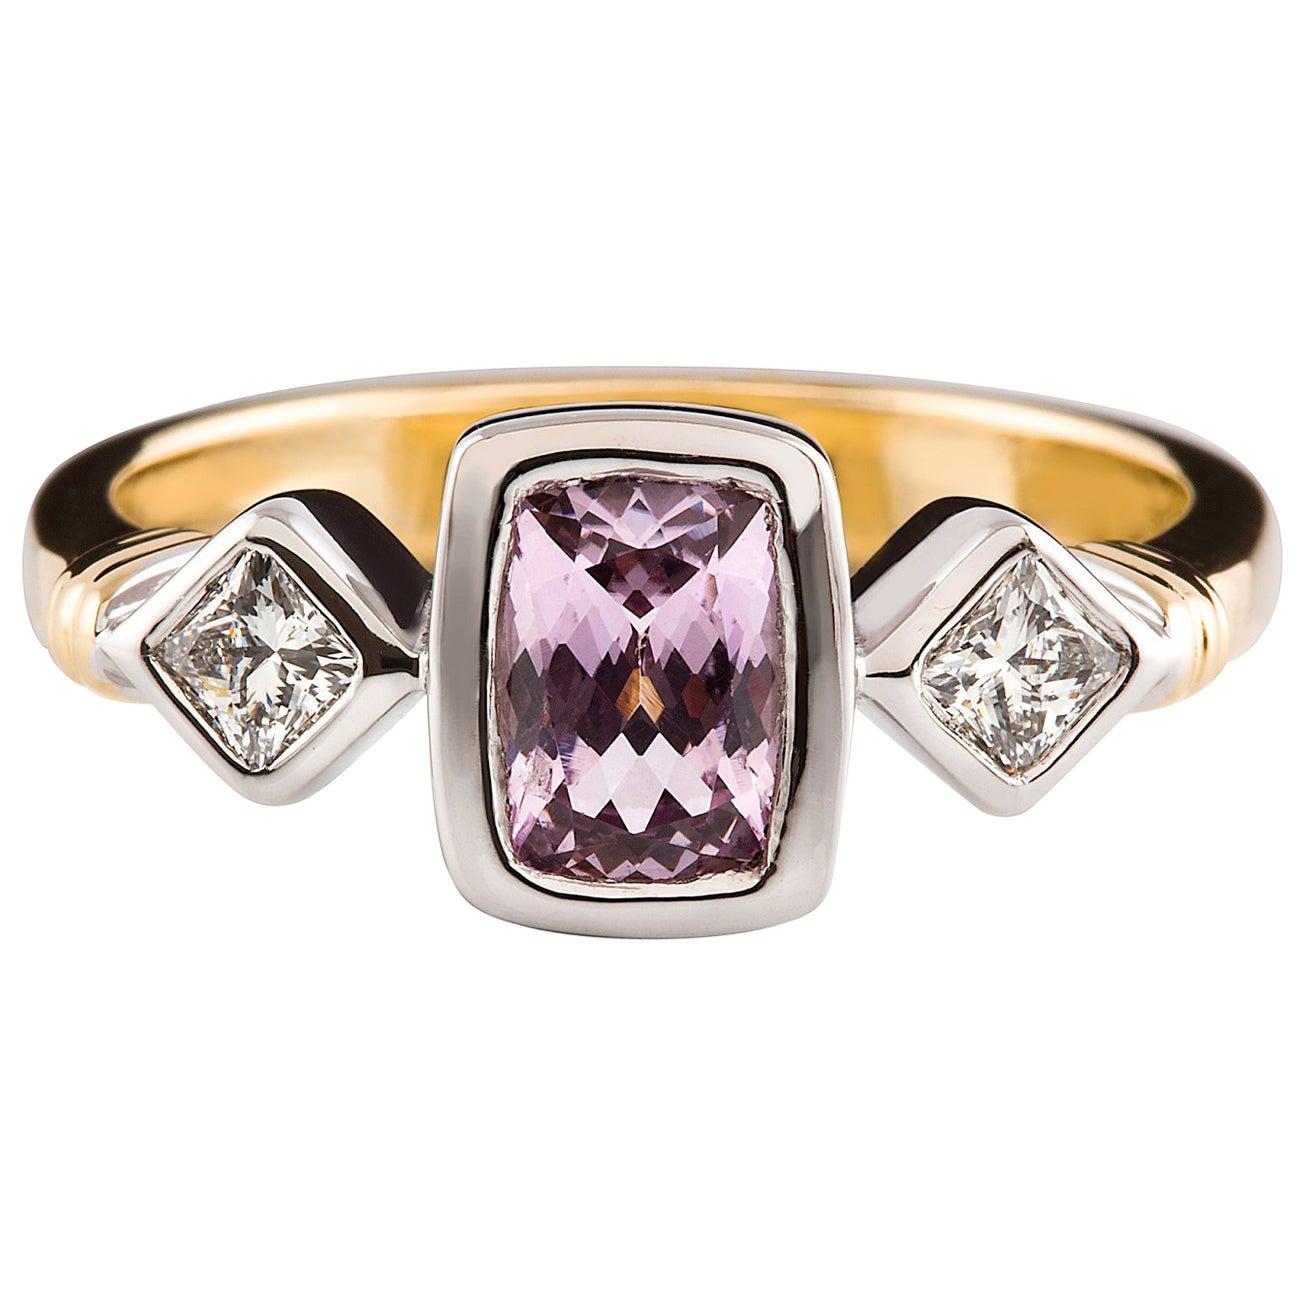 Kian Design 18 Carat Two-Tone Cushion Cut Pink Sapphire and Diamond Ring